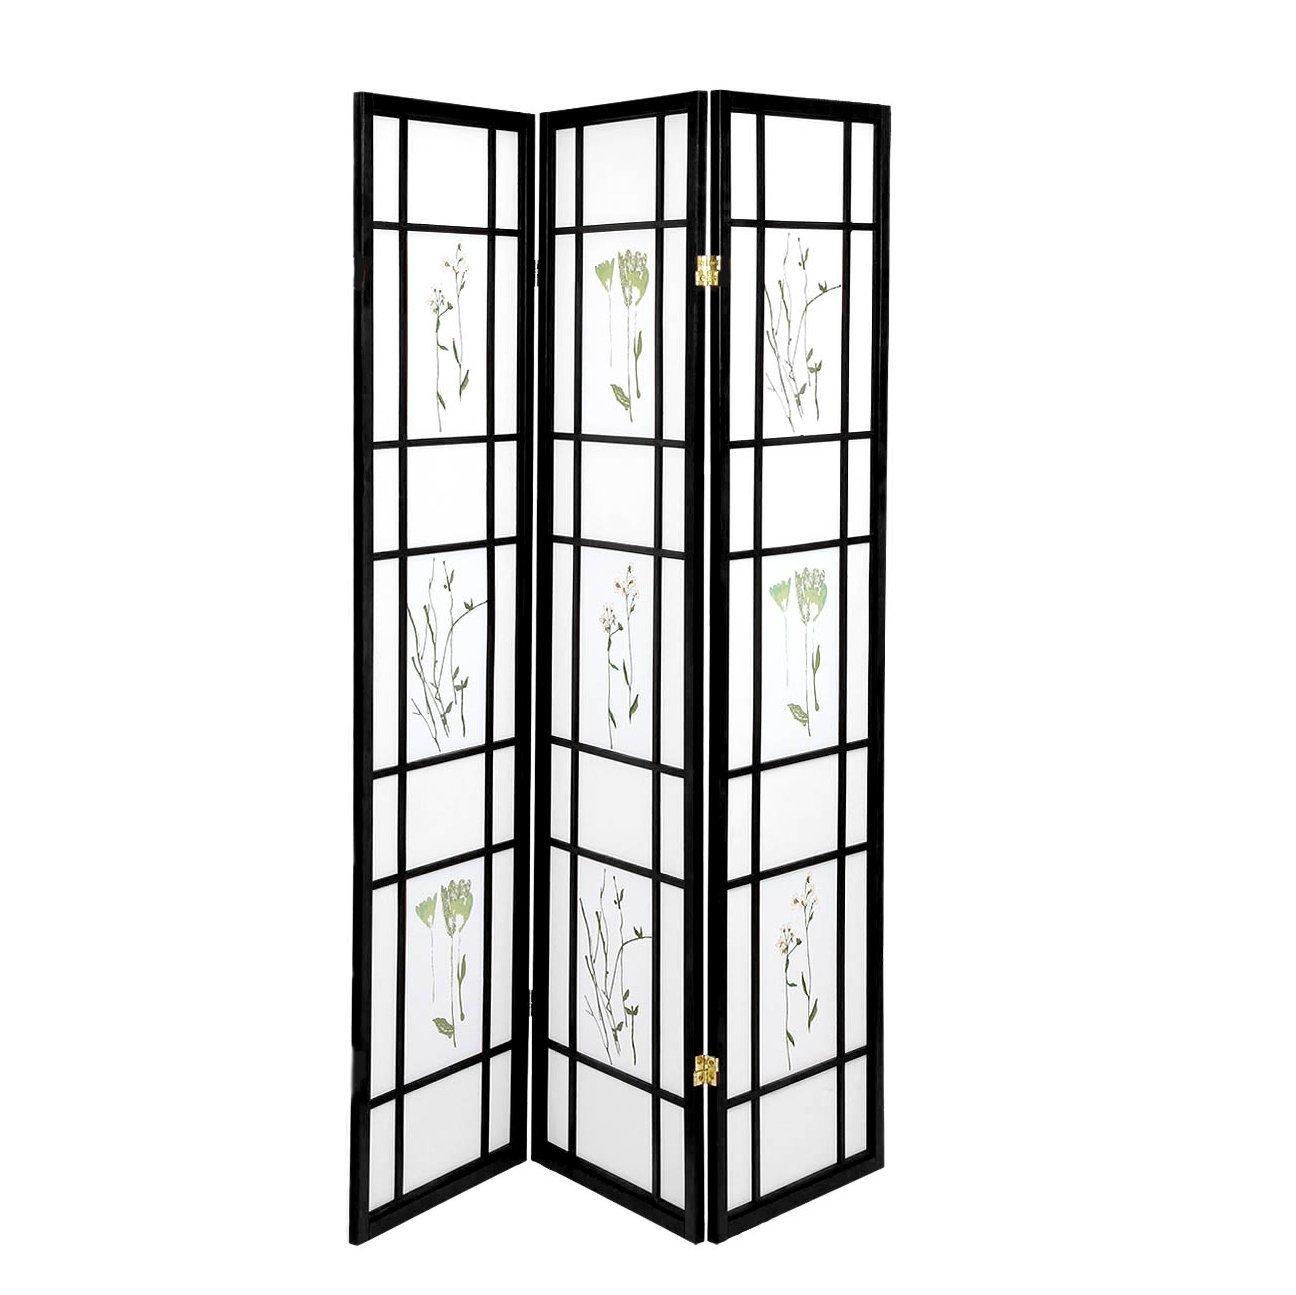 oriental room divider curtains hardwood shoji panels screen 3 panel small flowered black walmart com